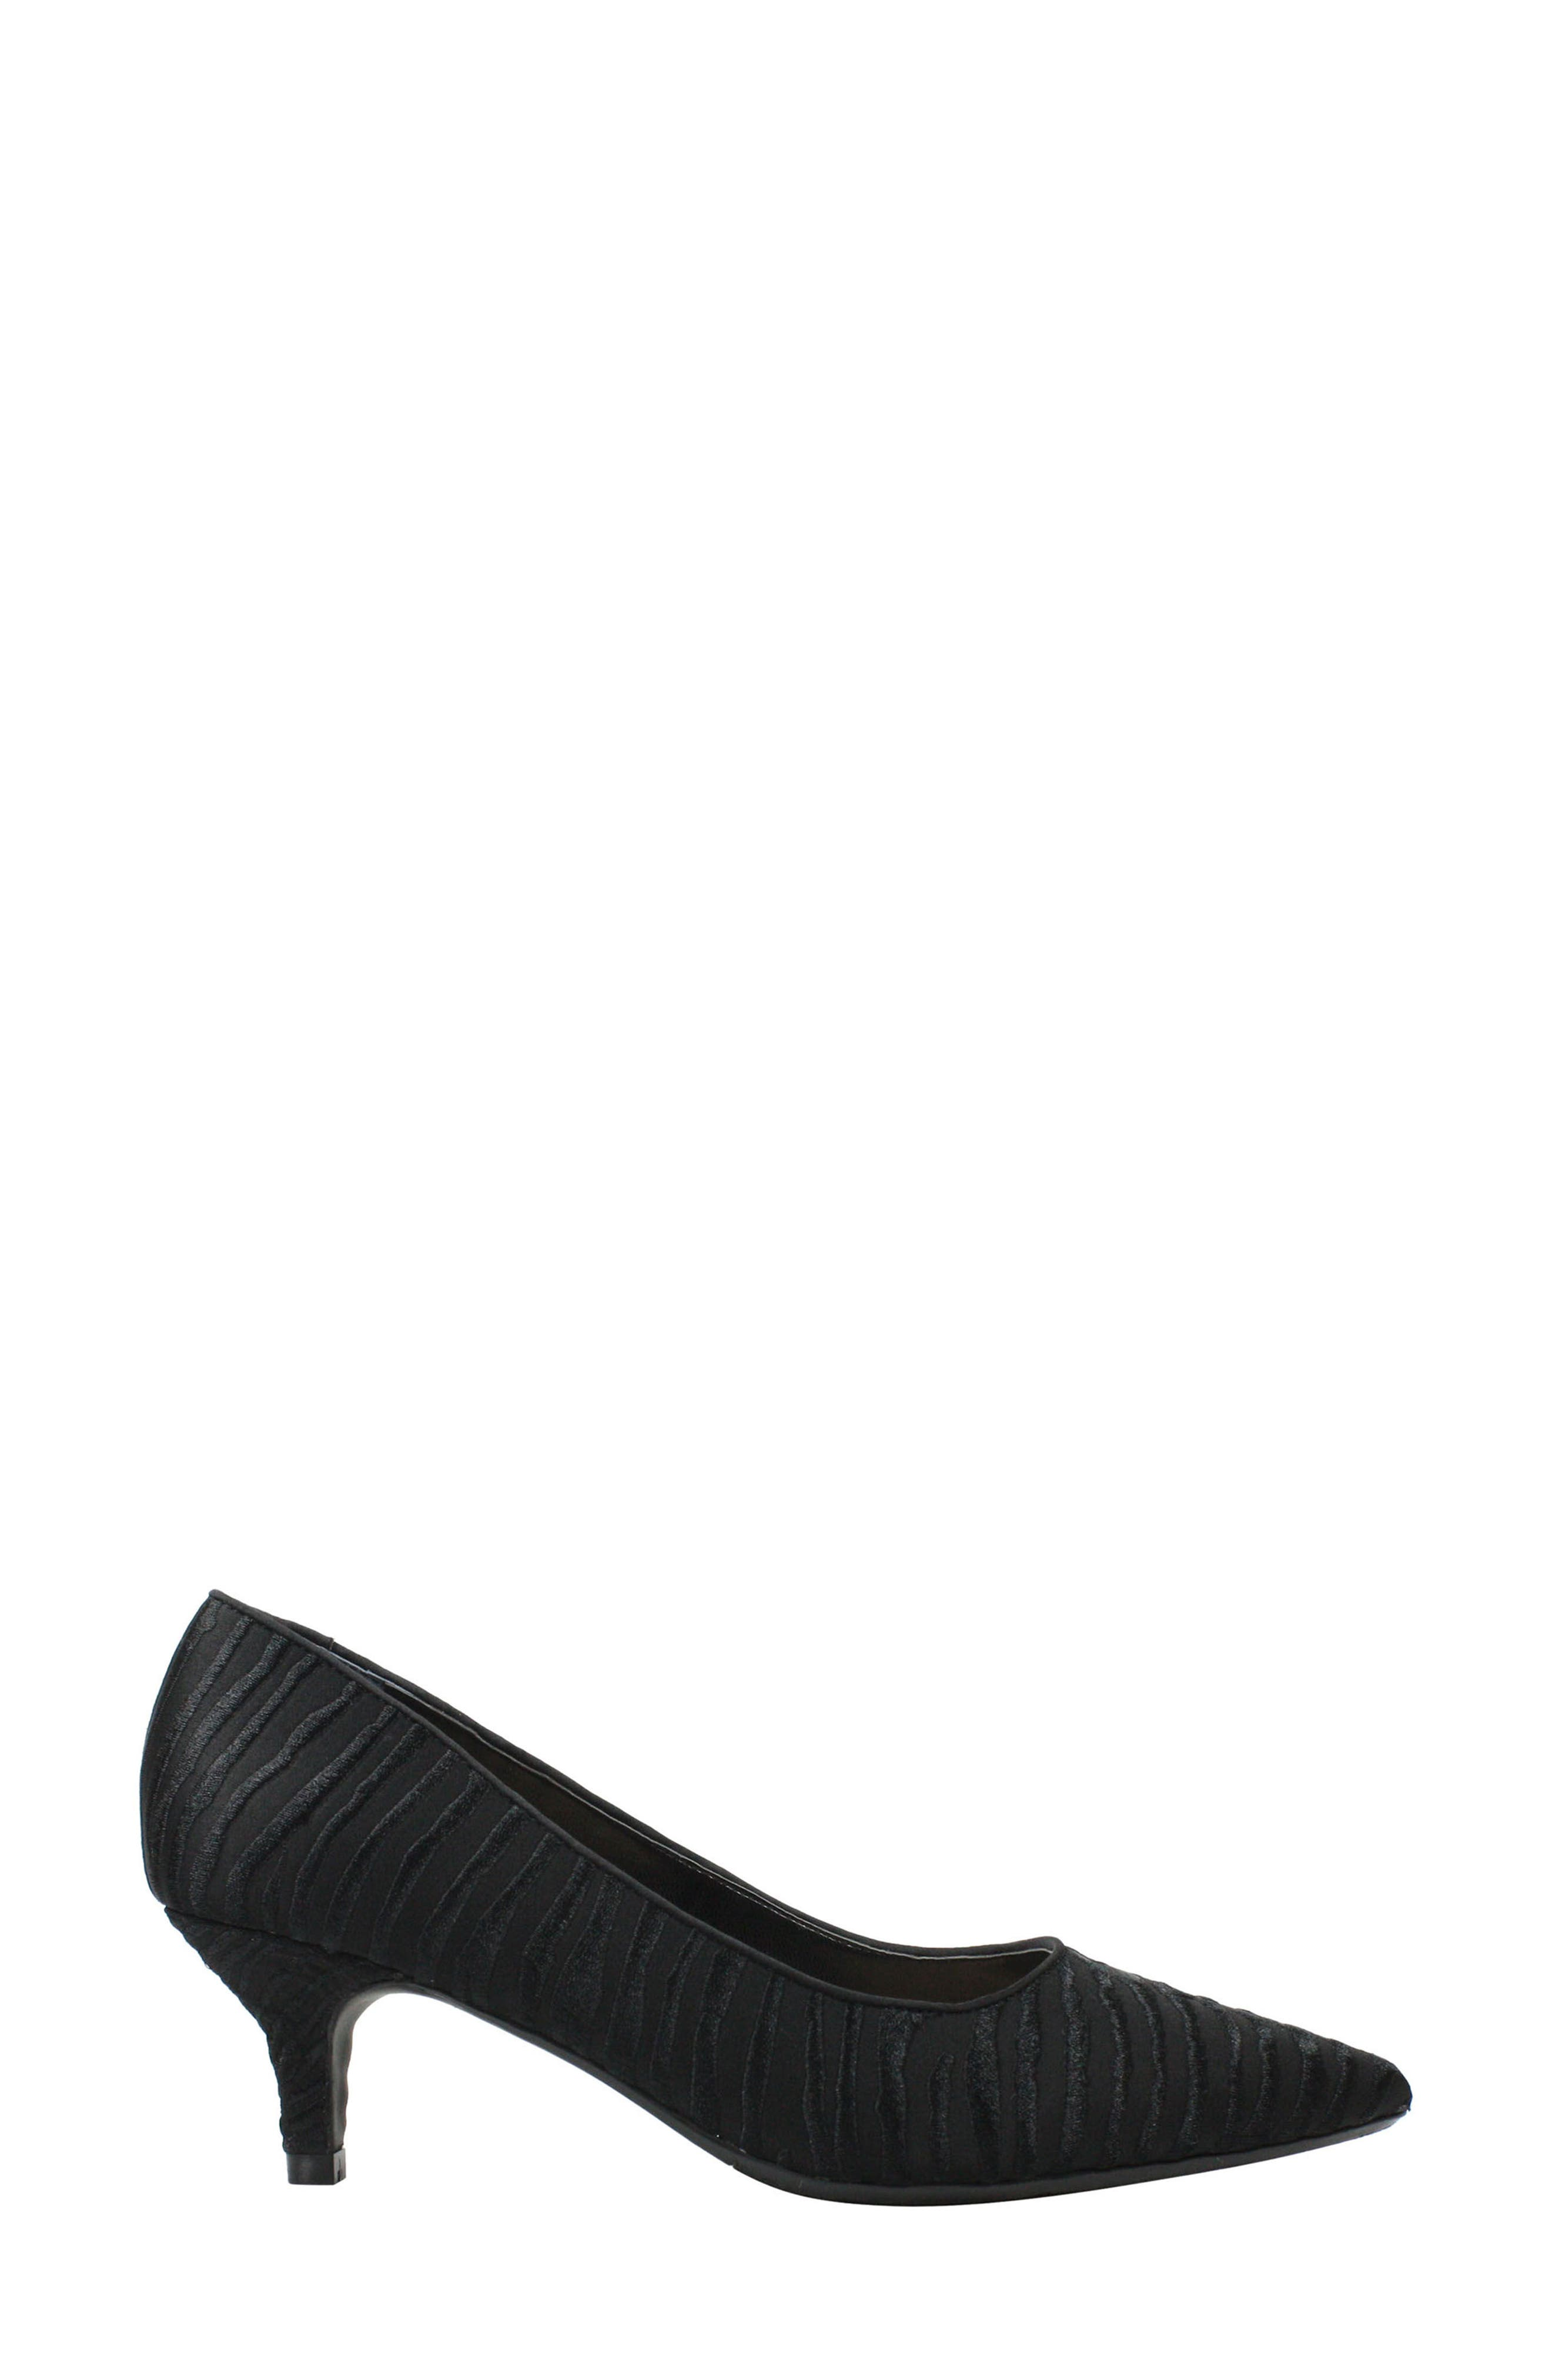 Zelaina Pump,                             Alternate thumbnail 3, color,                             Black/ Black Fabric